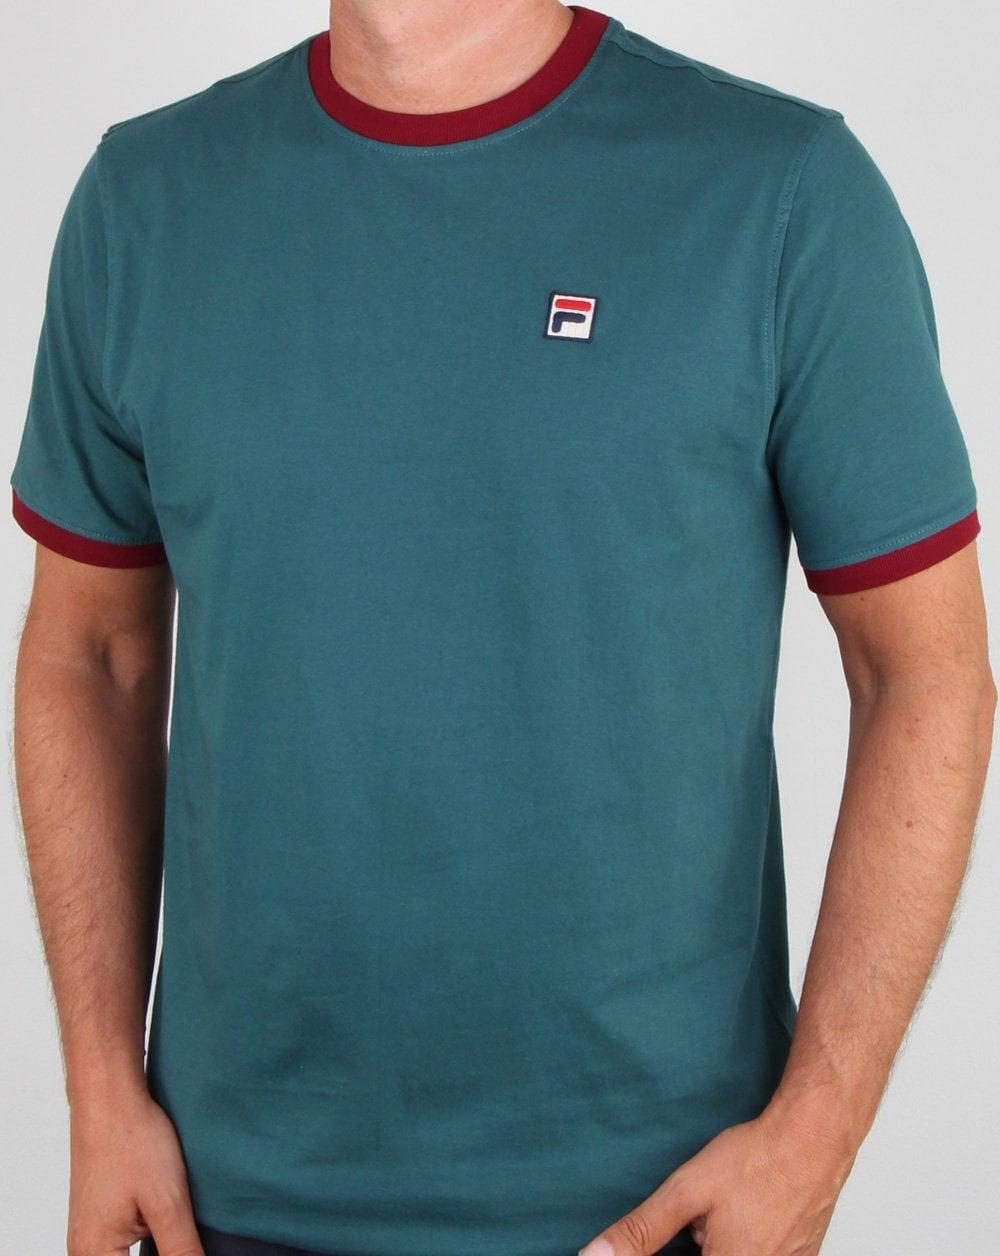 1a0df87f2dbd Fila Vintage Fila Vintage Marconi T Shirt Atlantic Blue